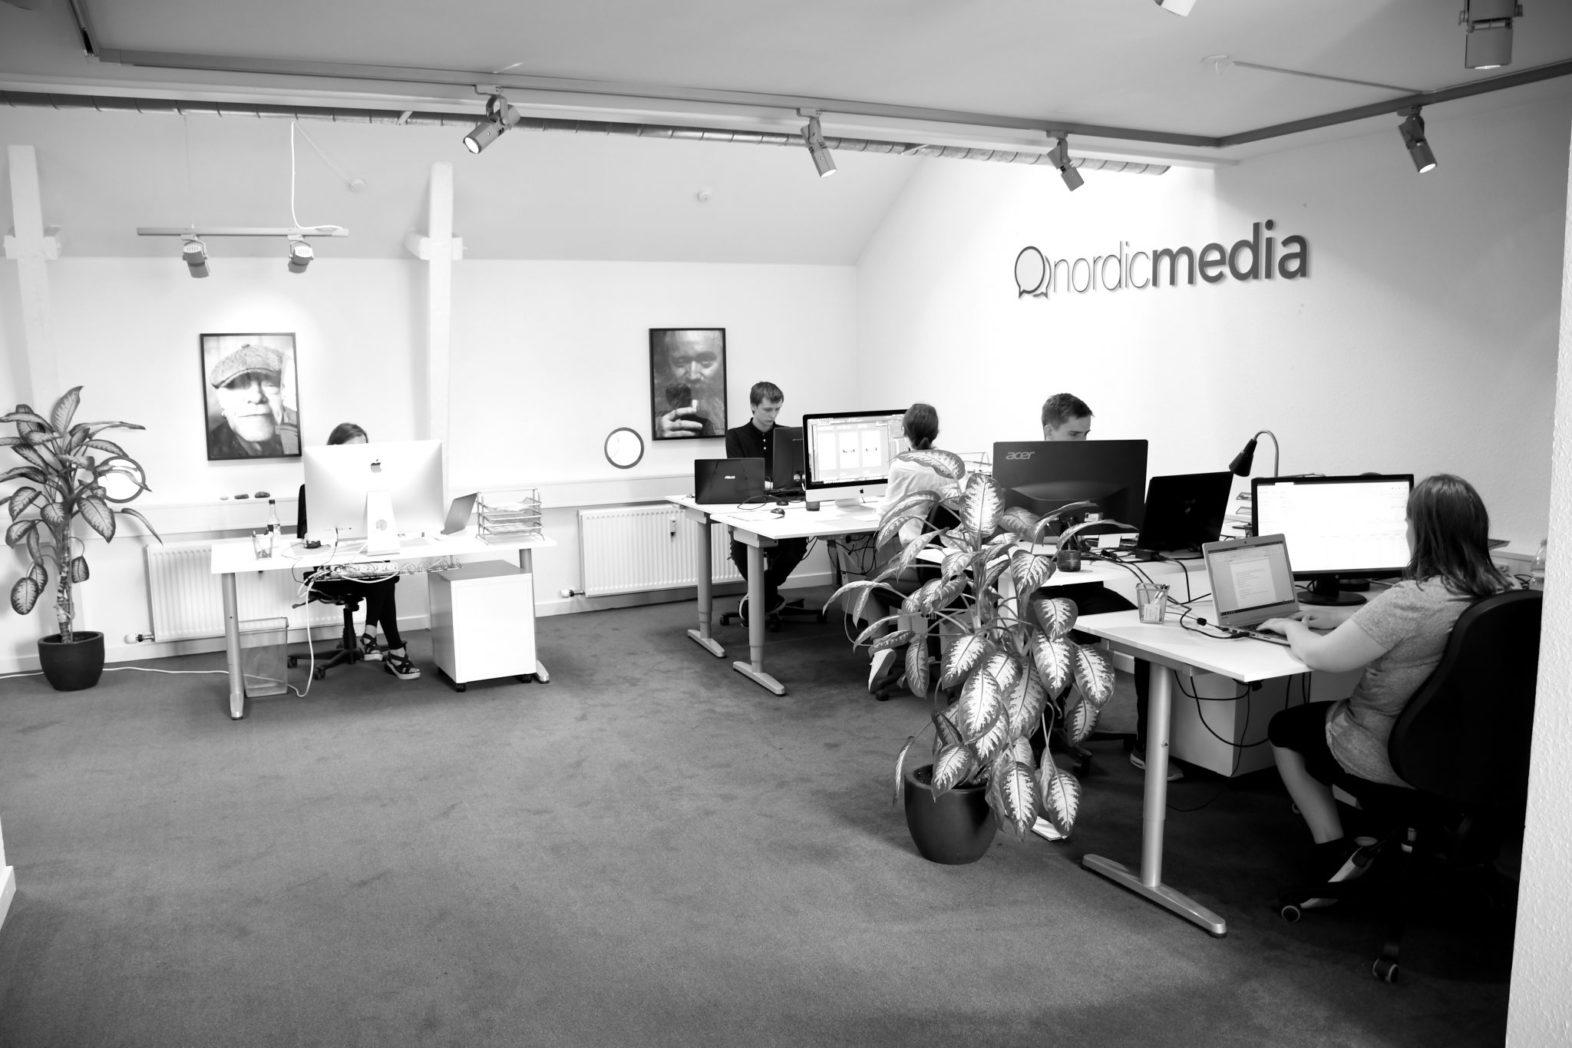 nordic media kontor img